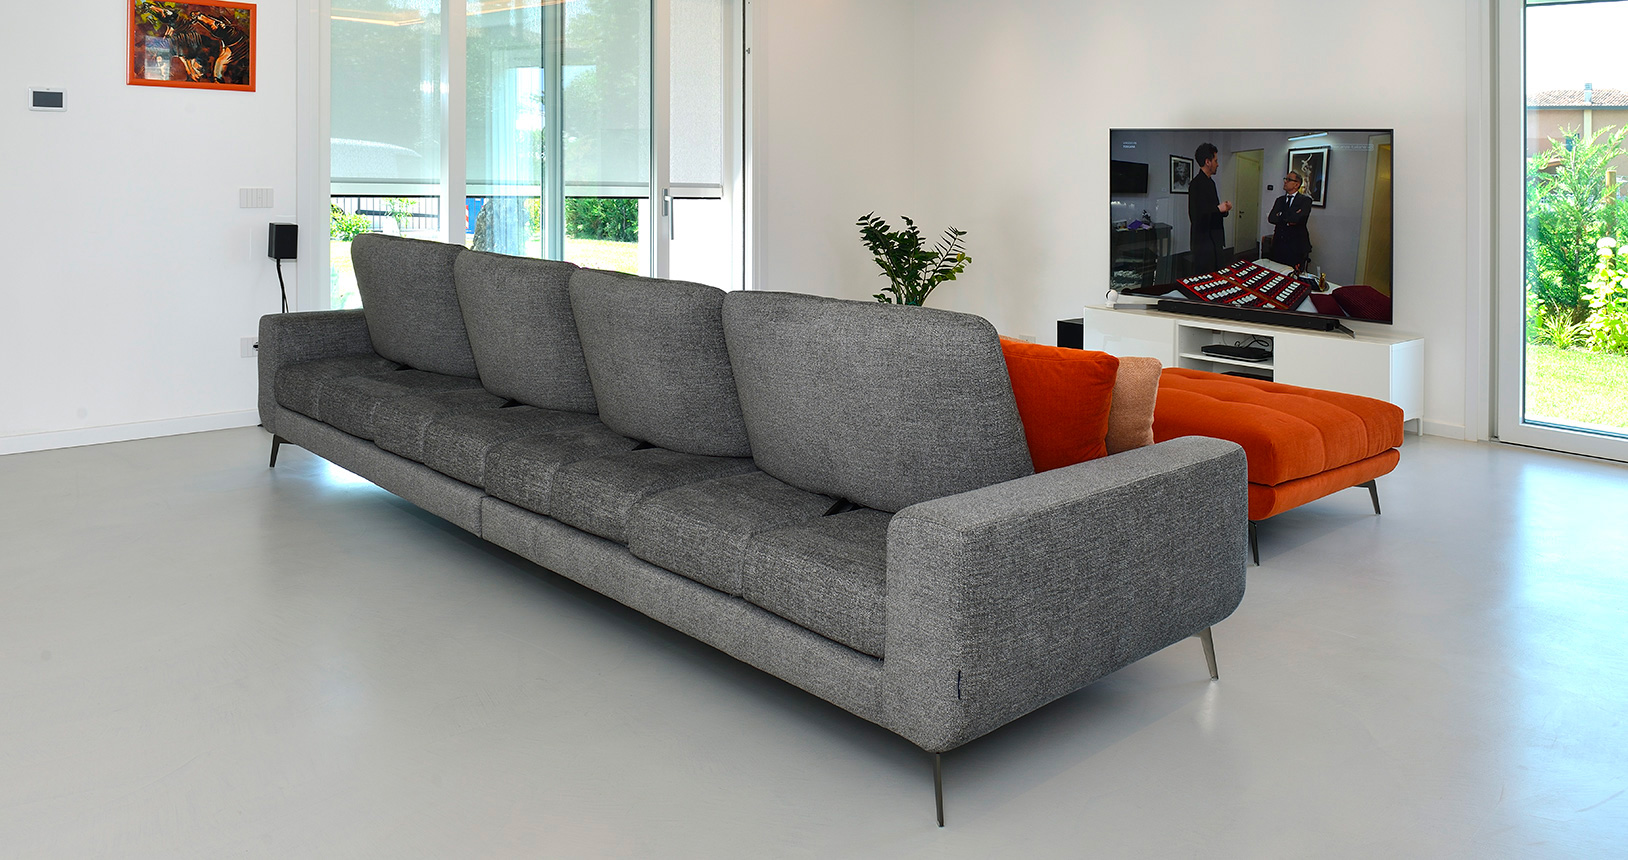 isabella-divano-grigio-retro2-pouf-arancio